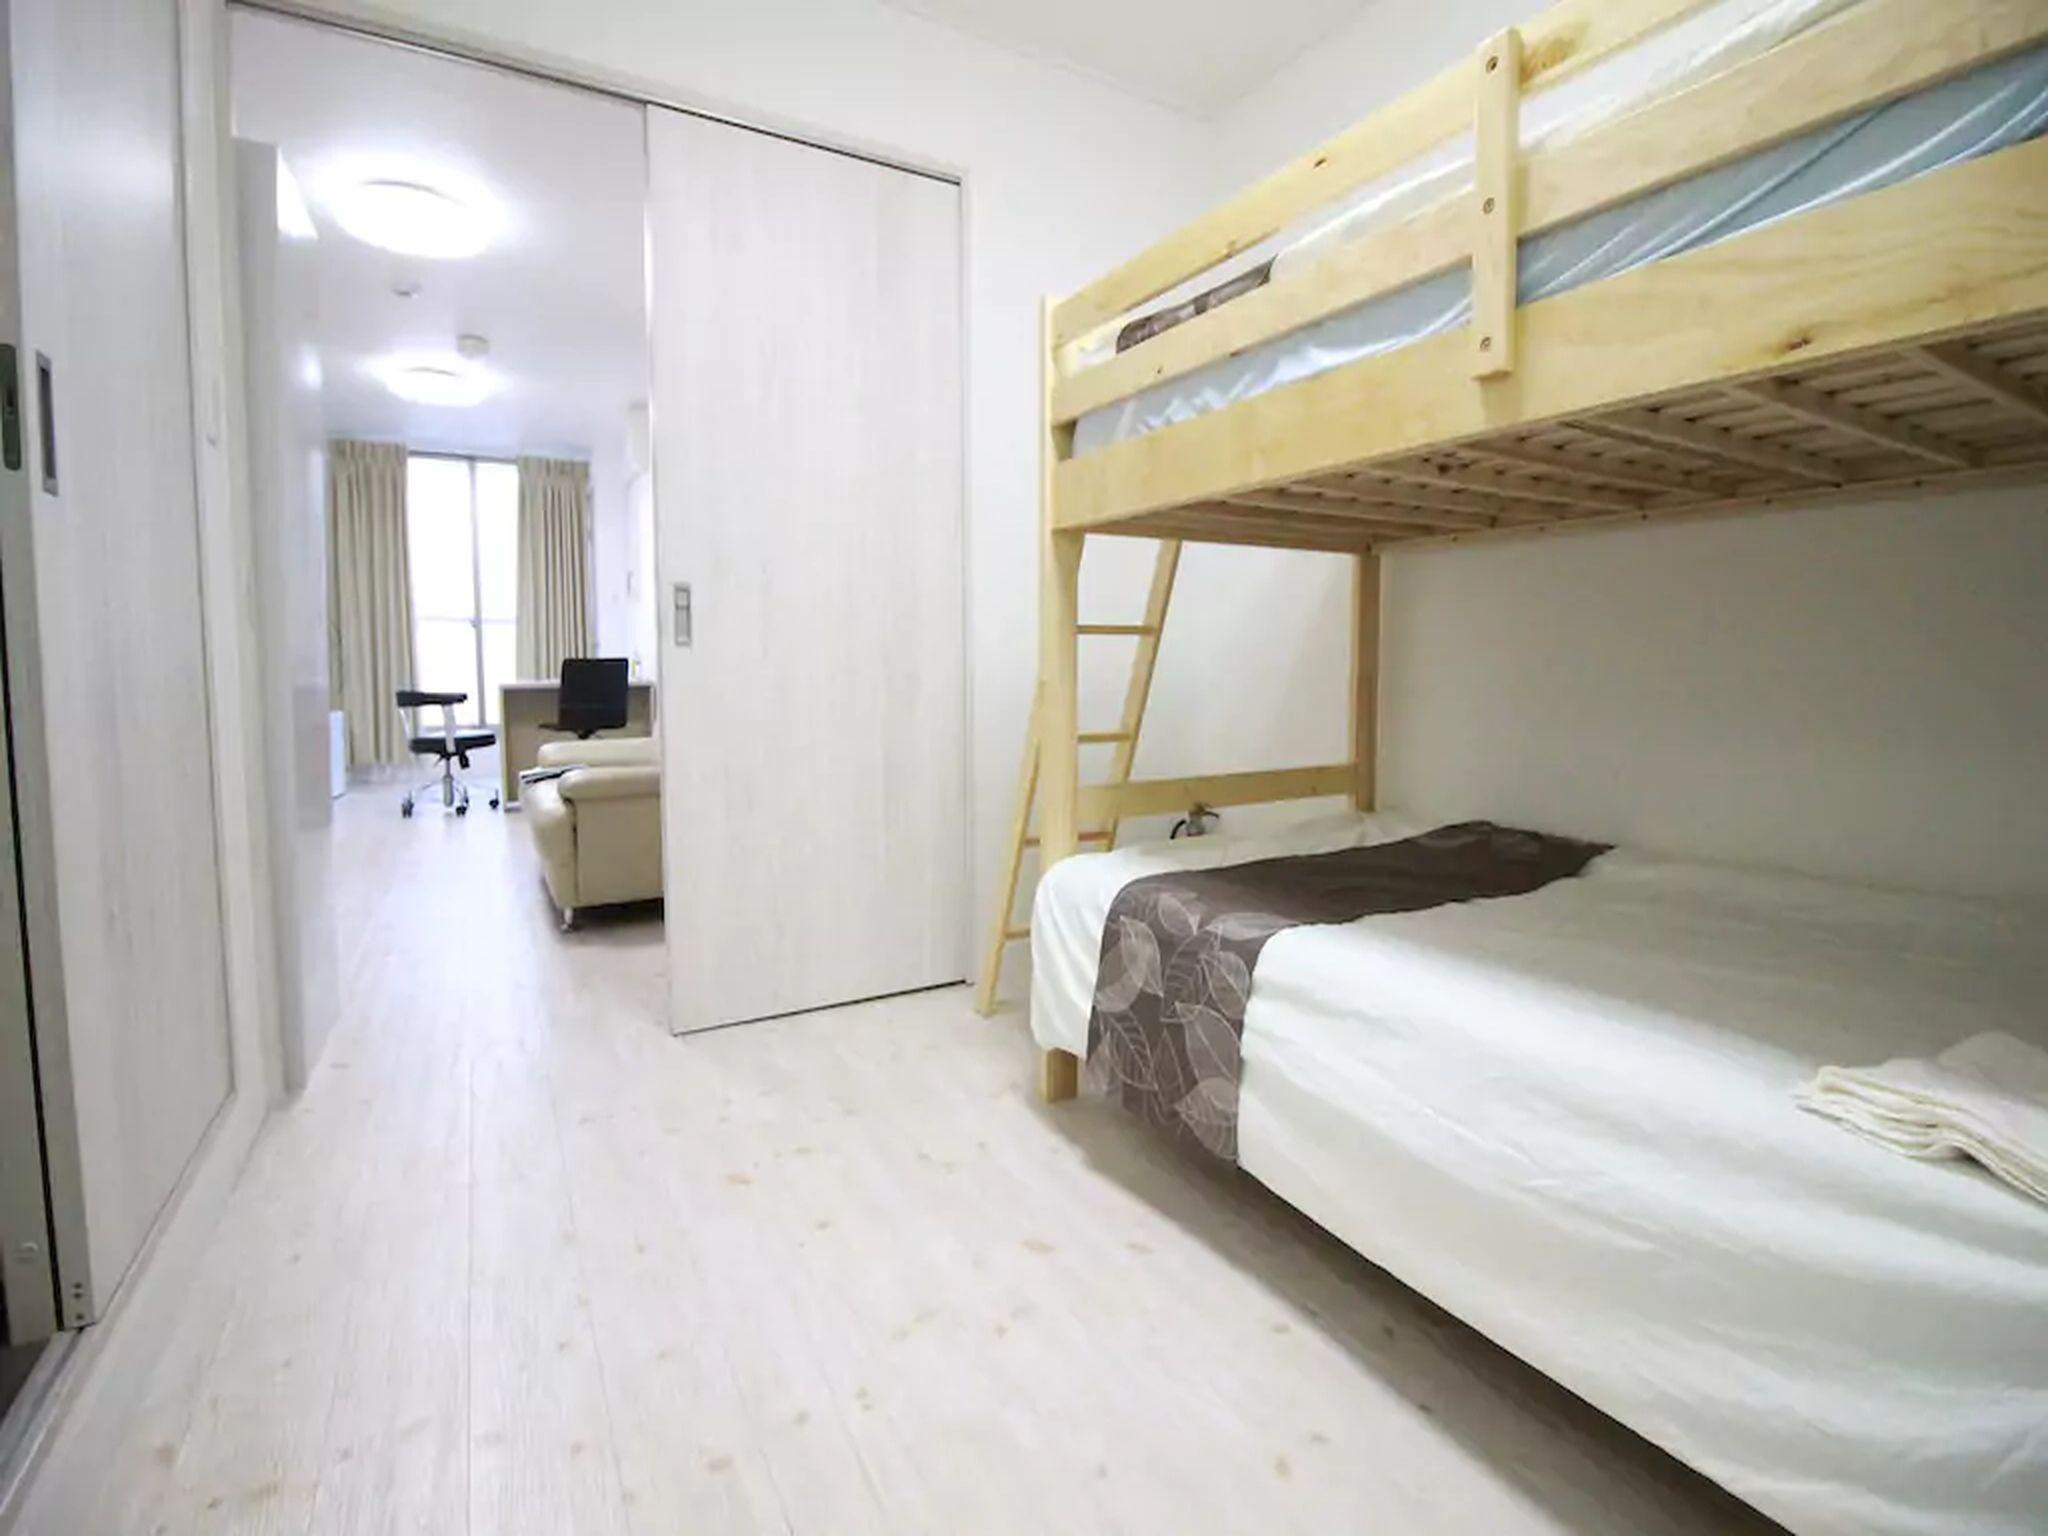 BB 3 Bedroom Share House In Tamatsukuri 2F 4F